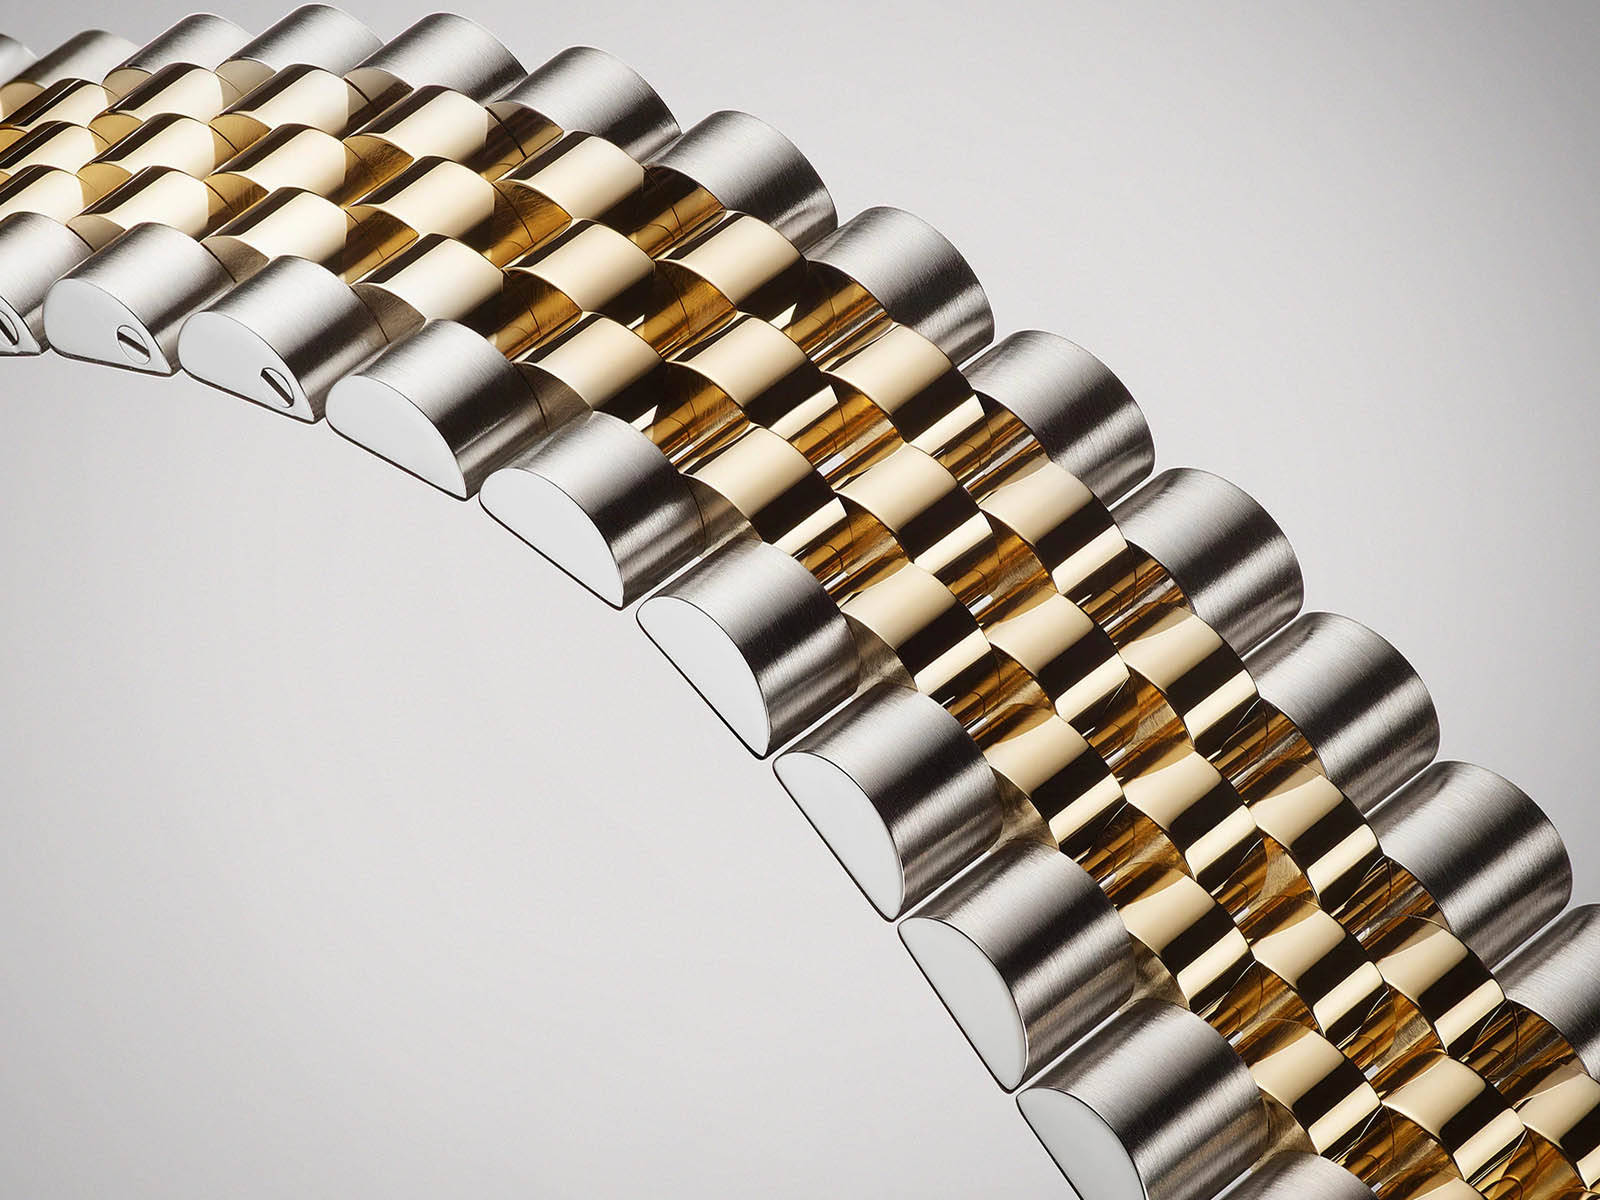 rolex-bracelets-and-straps-pearlmaster-1.jpg